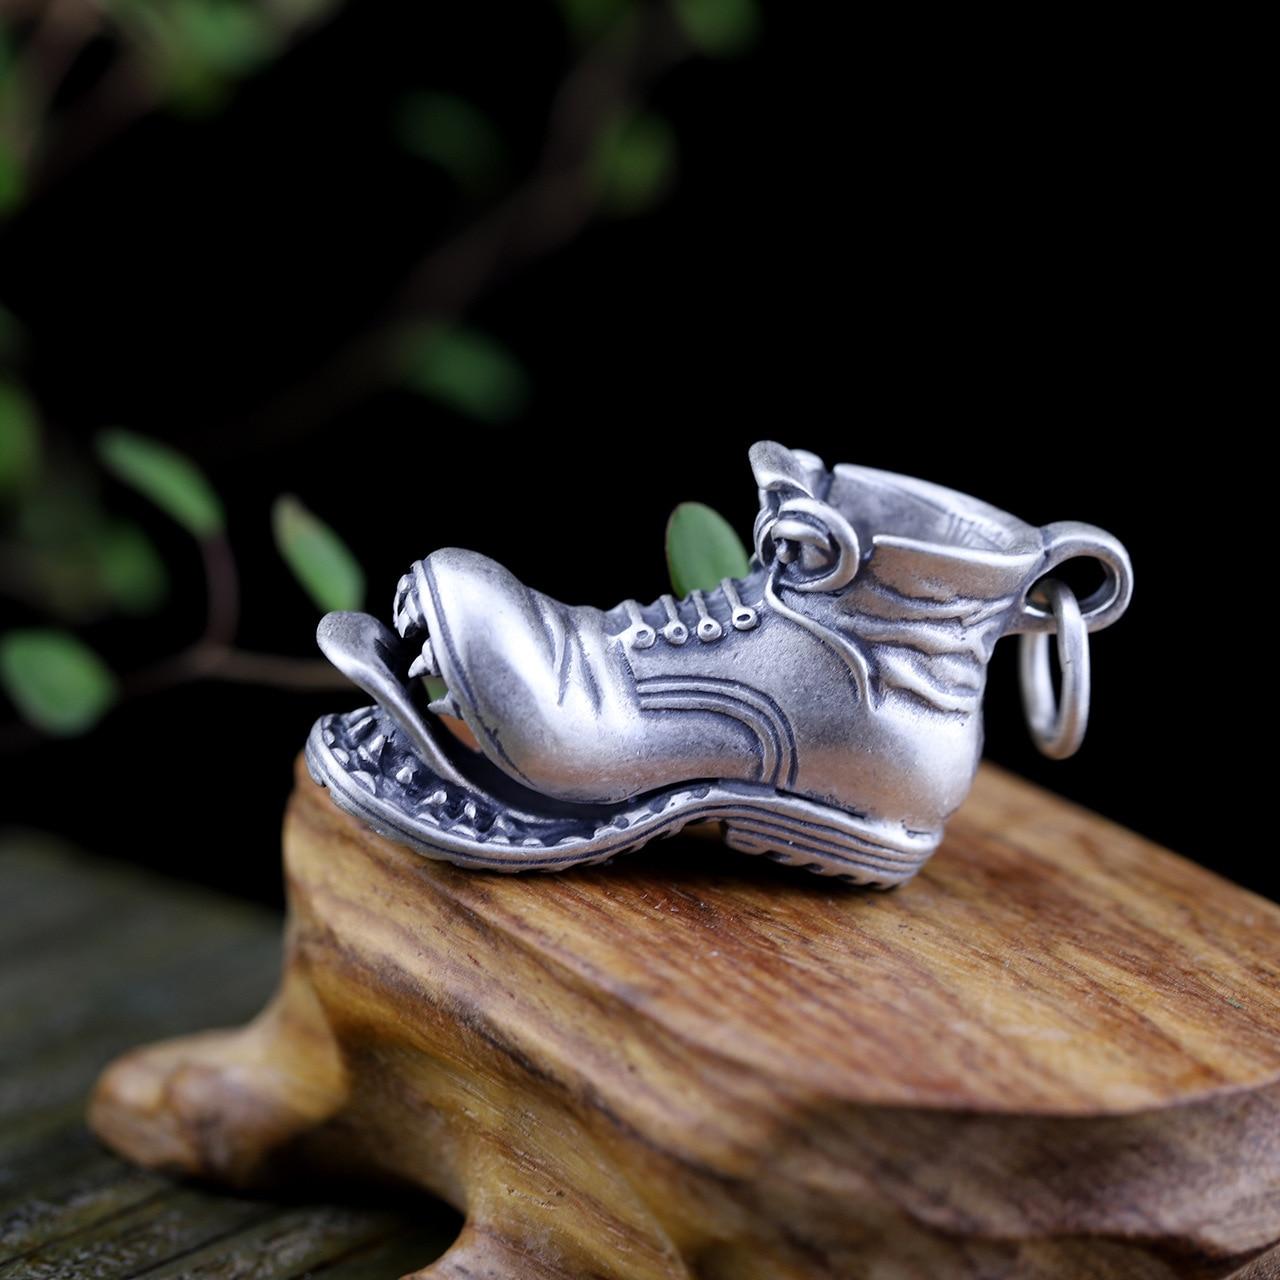 S925 pure silver ornaments Thai silver seiko men sautoir shoes pendant hip-hop personality s925 pure silver pendant archaize process new personality fashion skulls